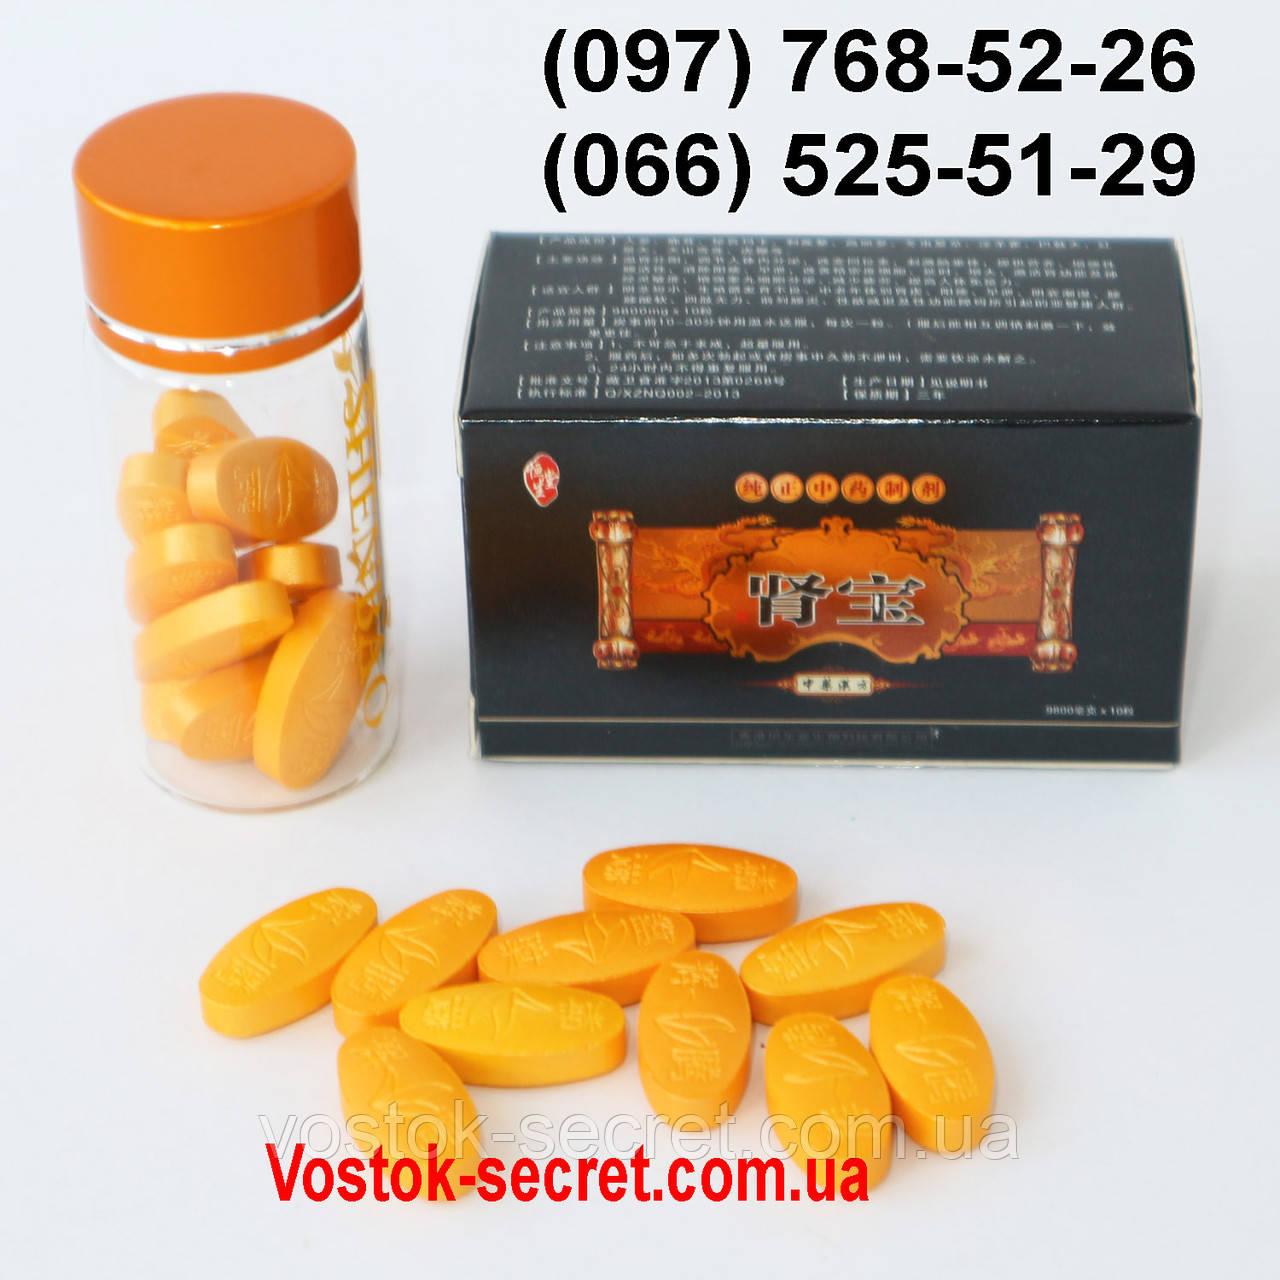 Китайский натуральный препарат Shen Bao (Шен Бао) 10табл.